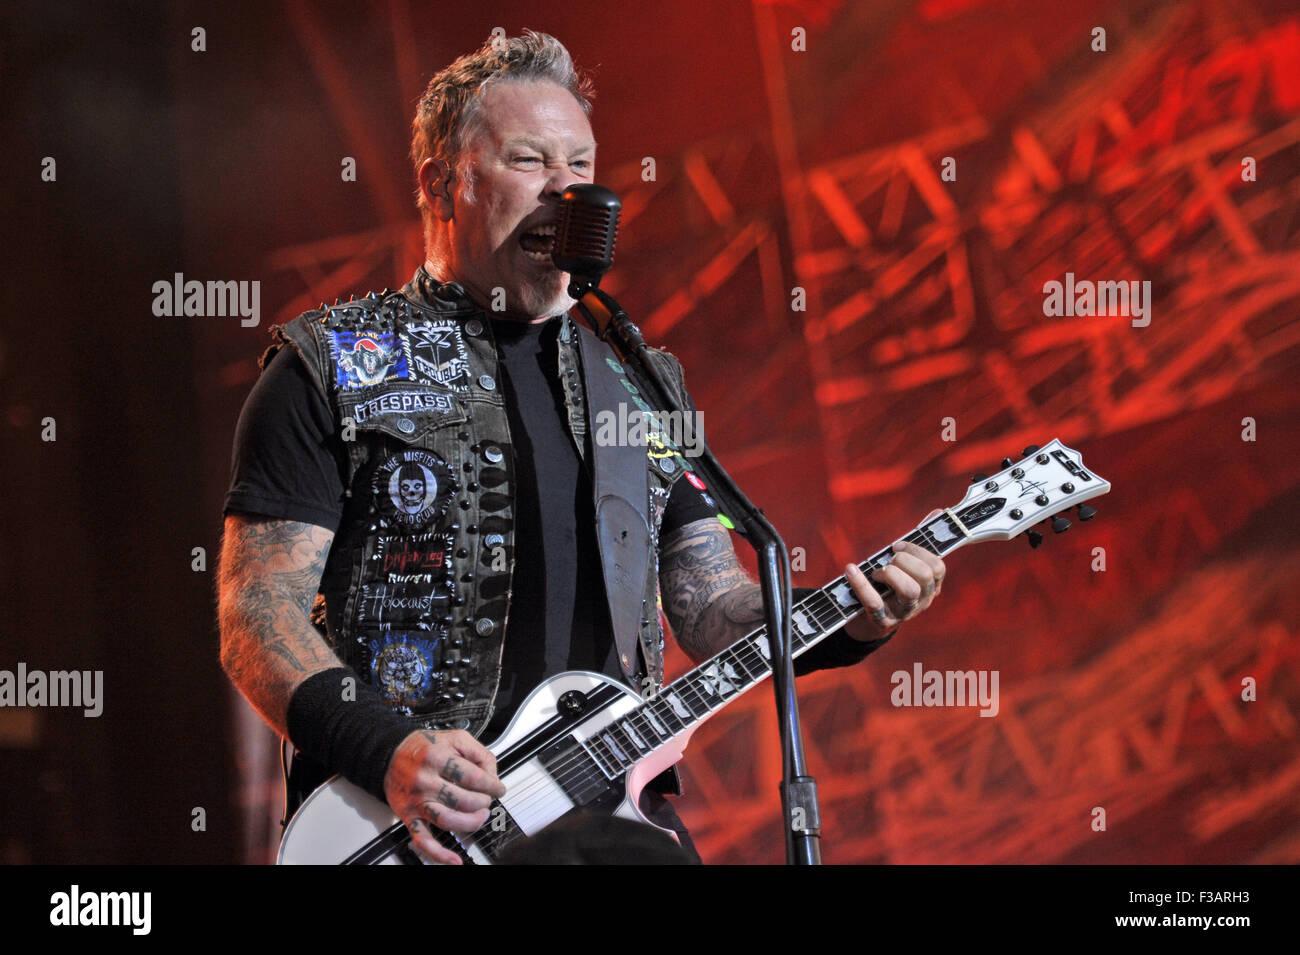 Lollapalooza Festival 2015 - Performances - Metallica  Featuring: James Hetfield, Metallica Where: Chicago, Illinois, - Stock Image